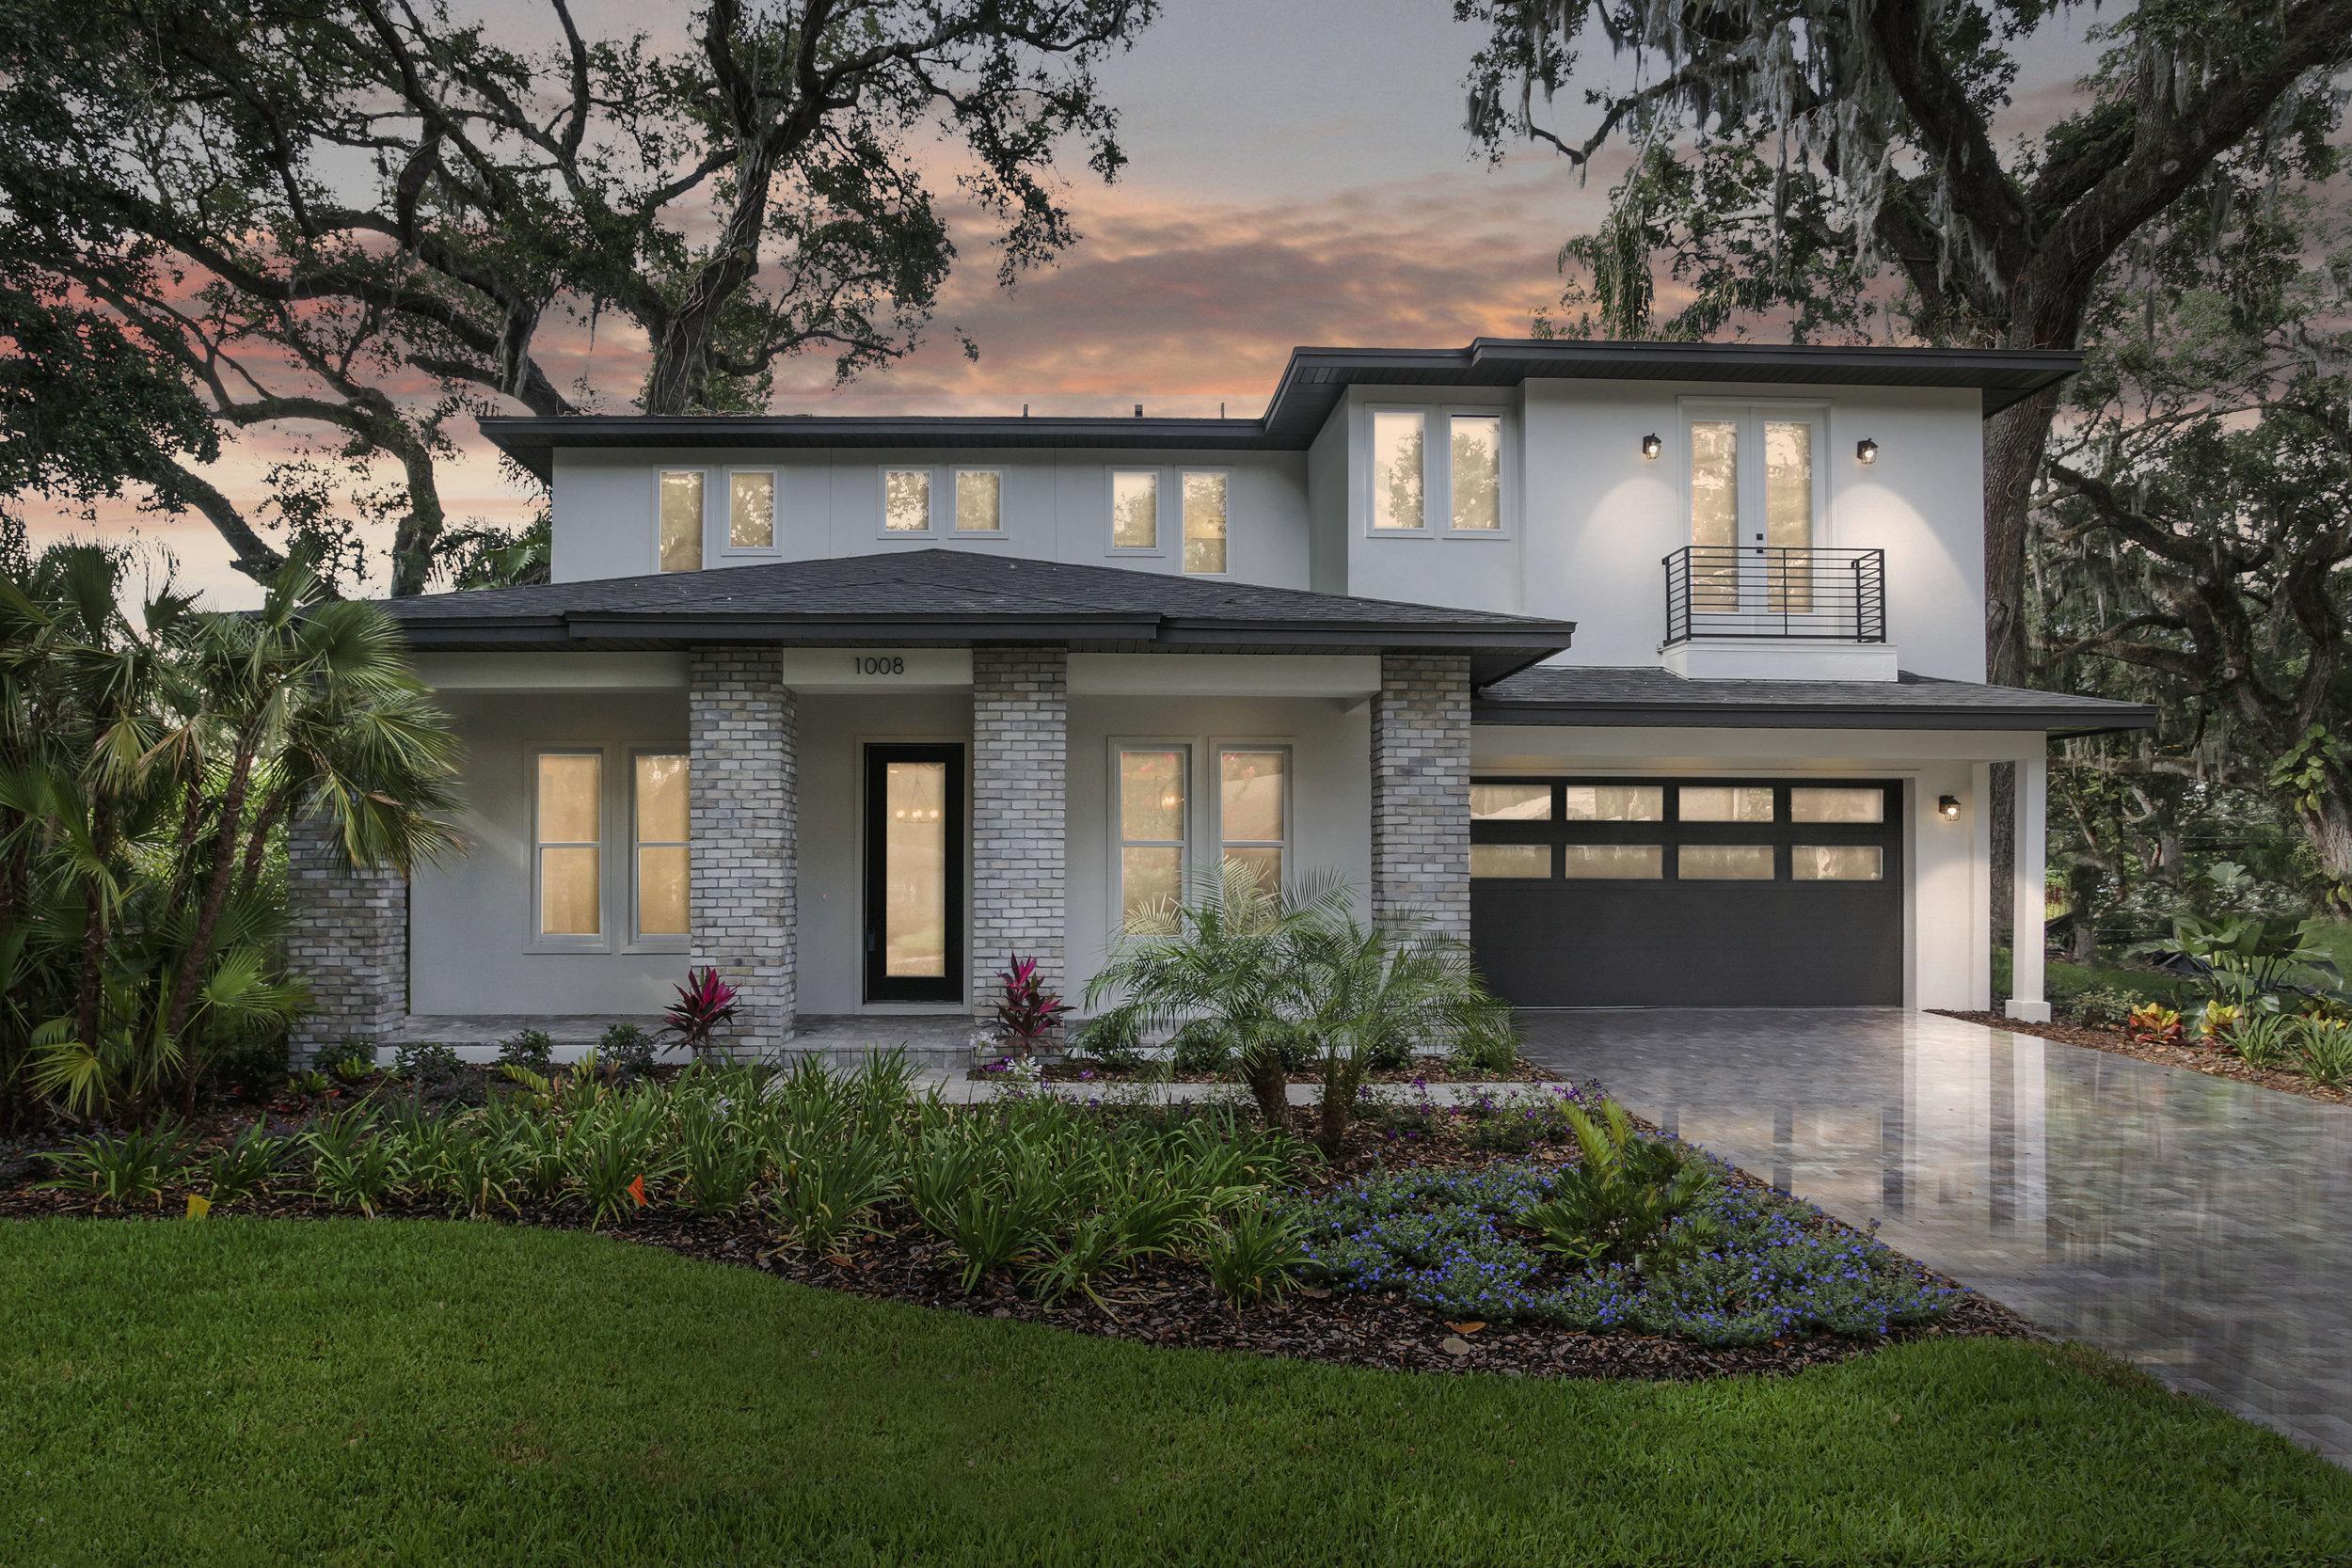 1008 Greenwood St, Orlando_IMG_4880 Orang.jpg